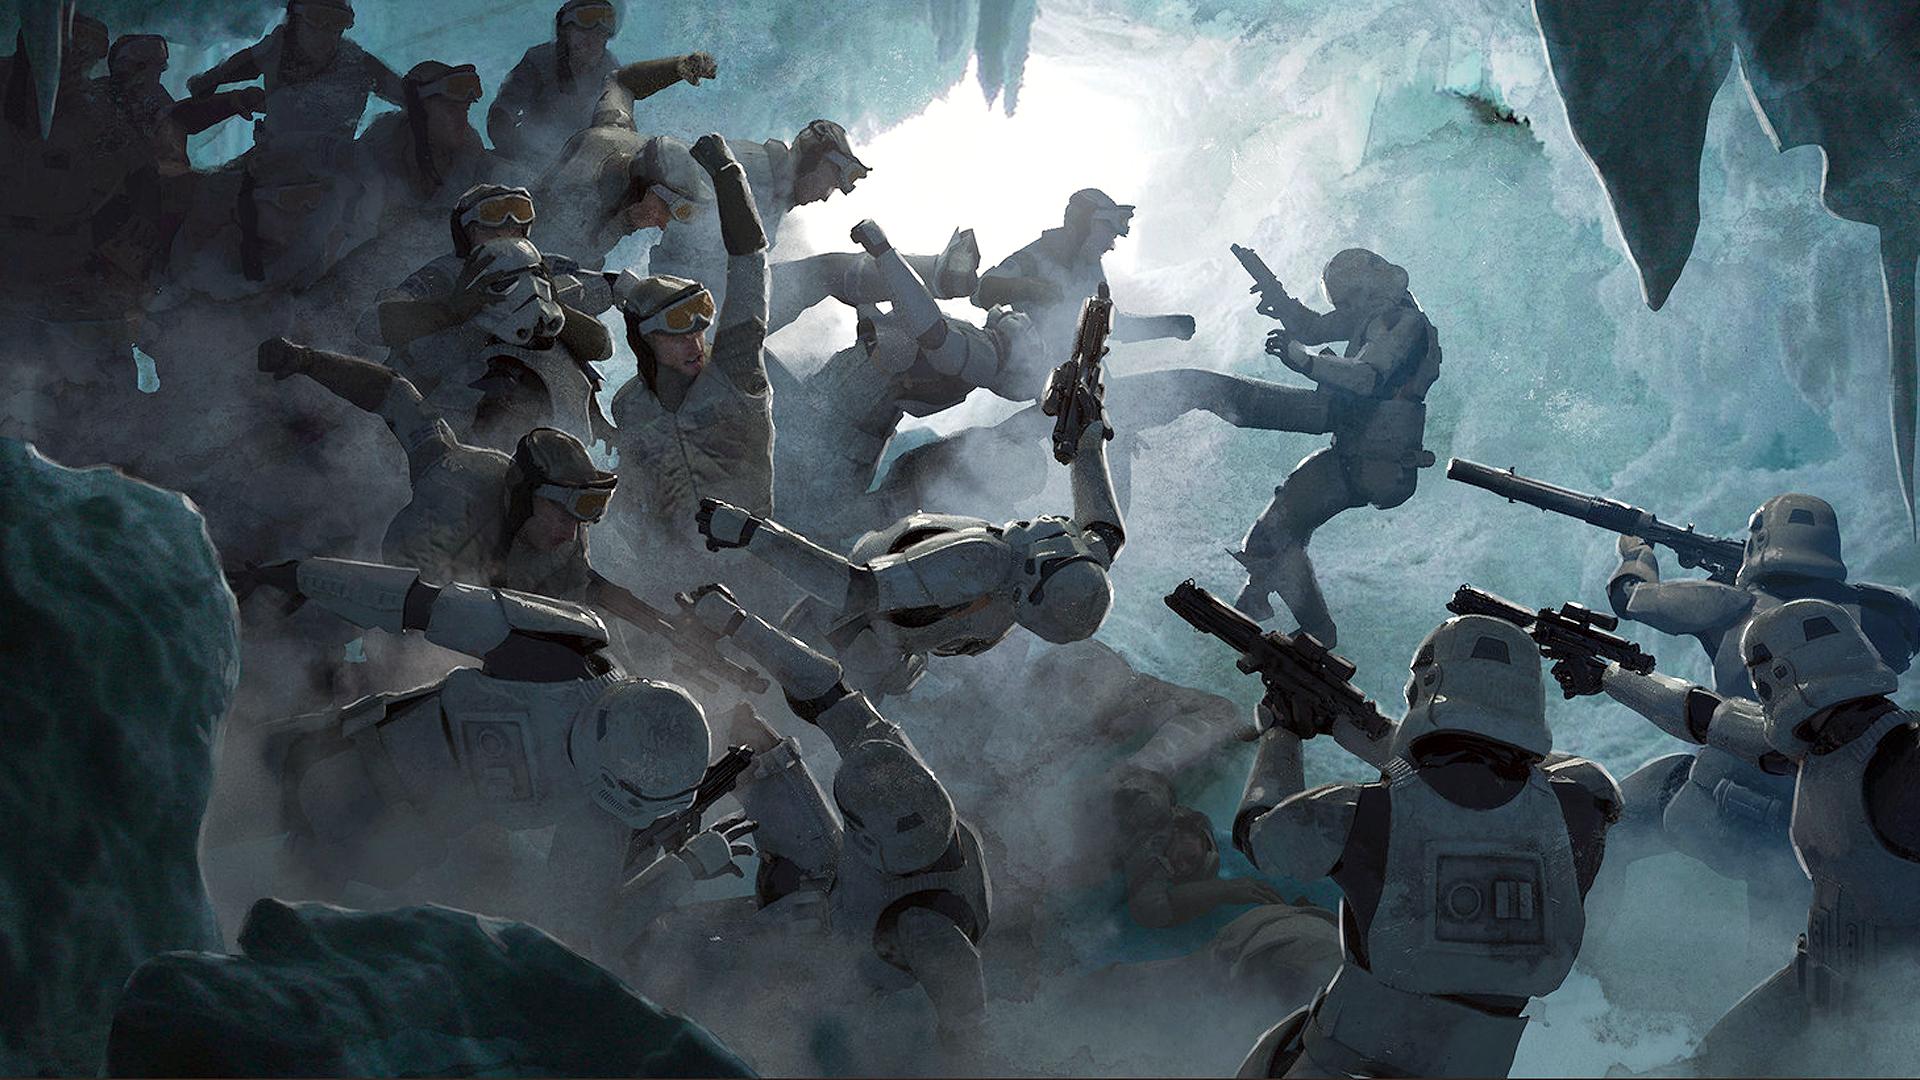 Wallpaper Guillem H Pongiluppi Digital Art Artwork Star Wars Stormtrooper Rebels Battle Ice Cave Kick Blaster Movie Characters Science Fiction 1920x1080 Benabuggs 1695397 Hd Wallpapers Wallhere